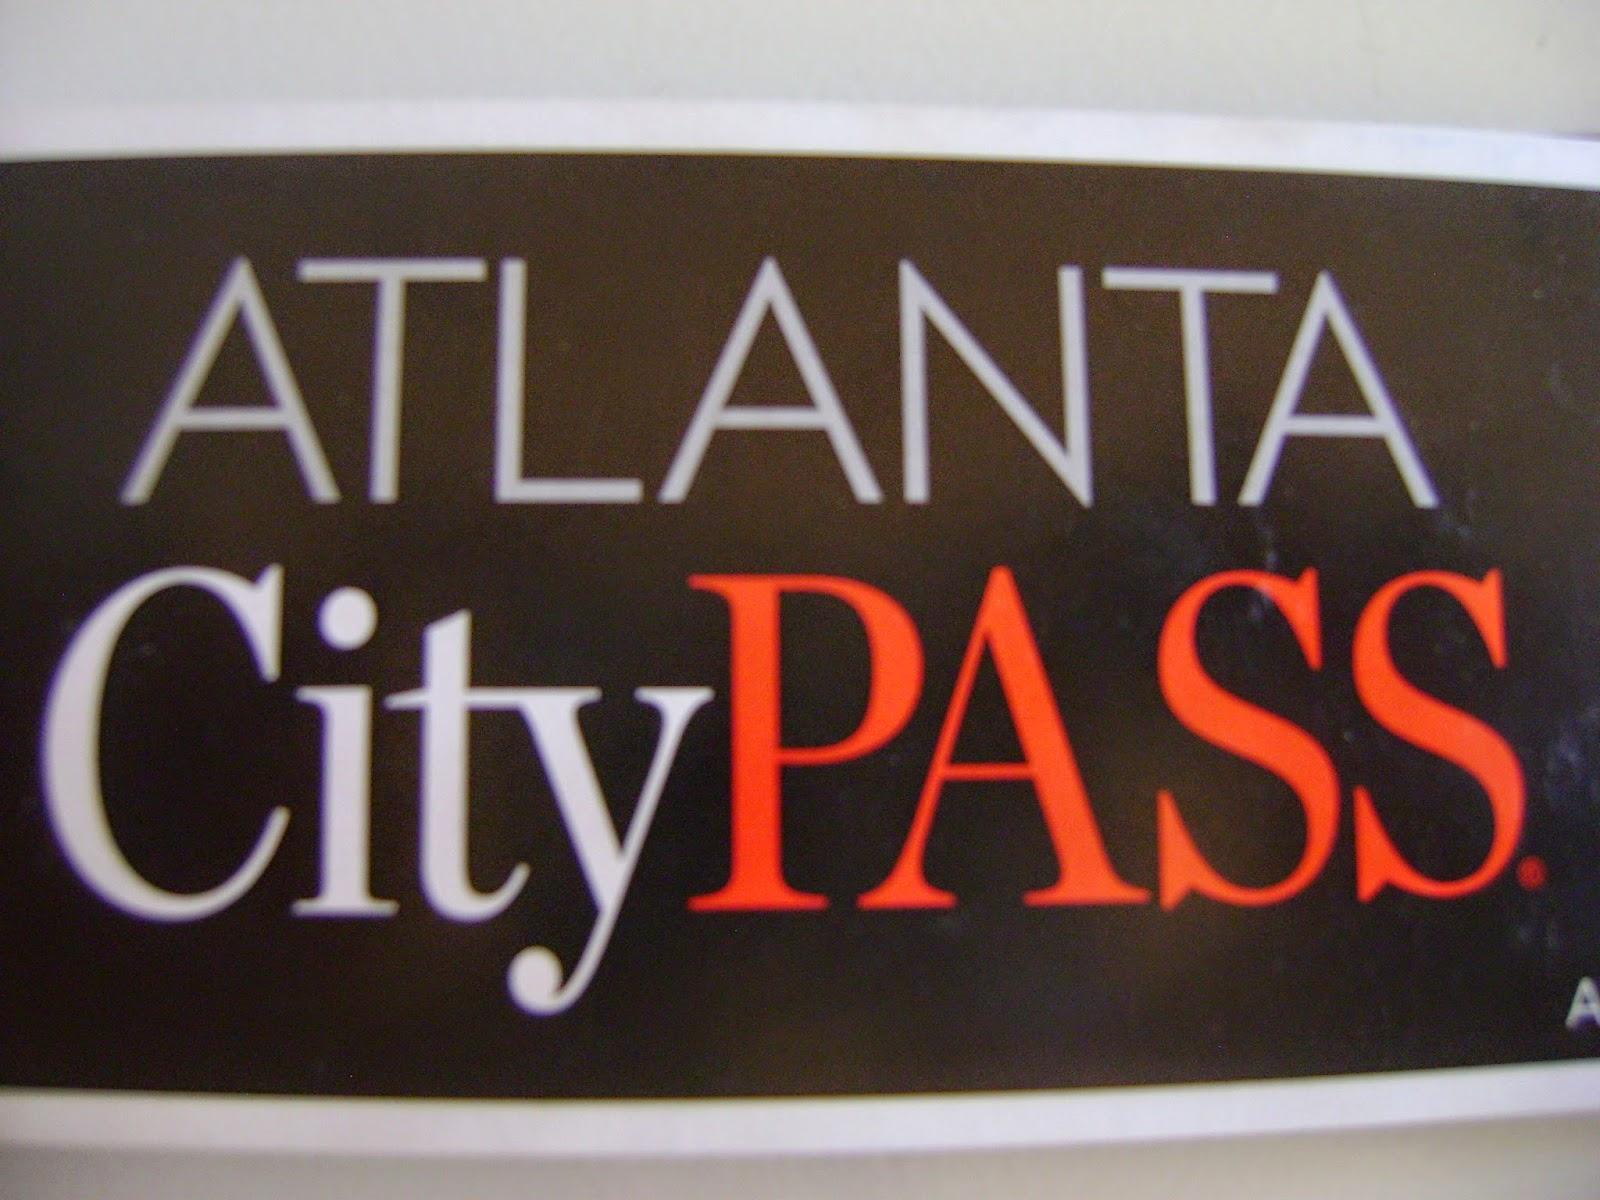 City Pass Atlanta